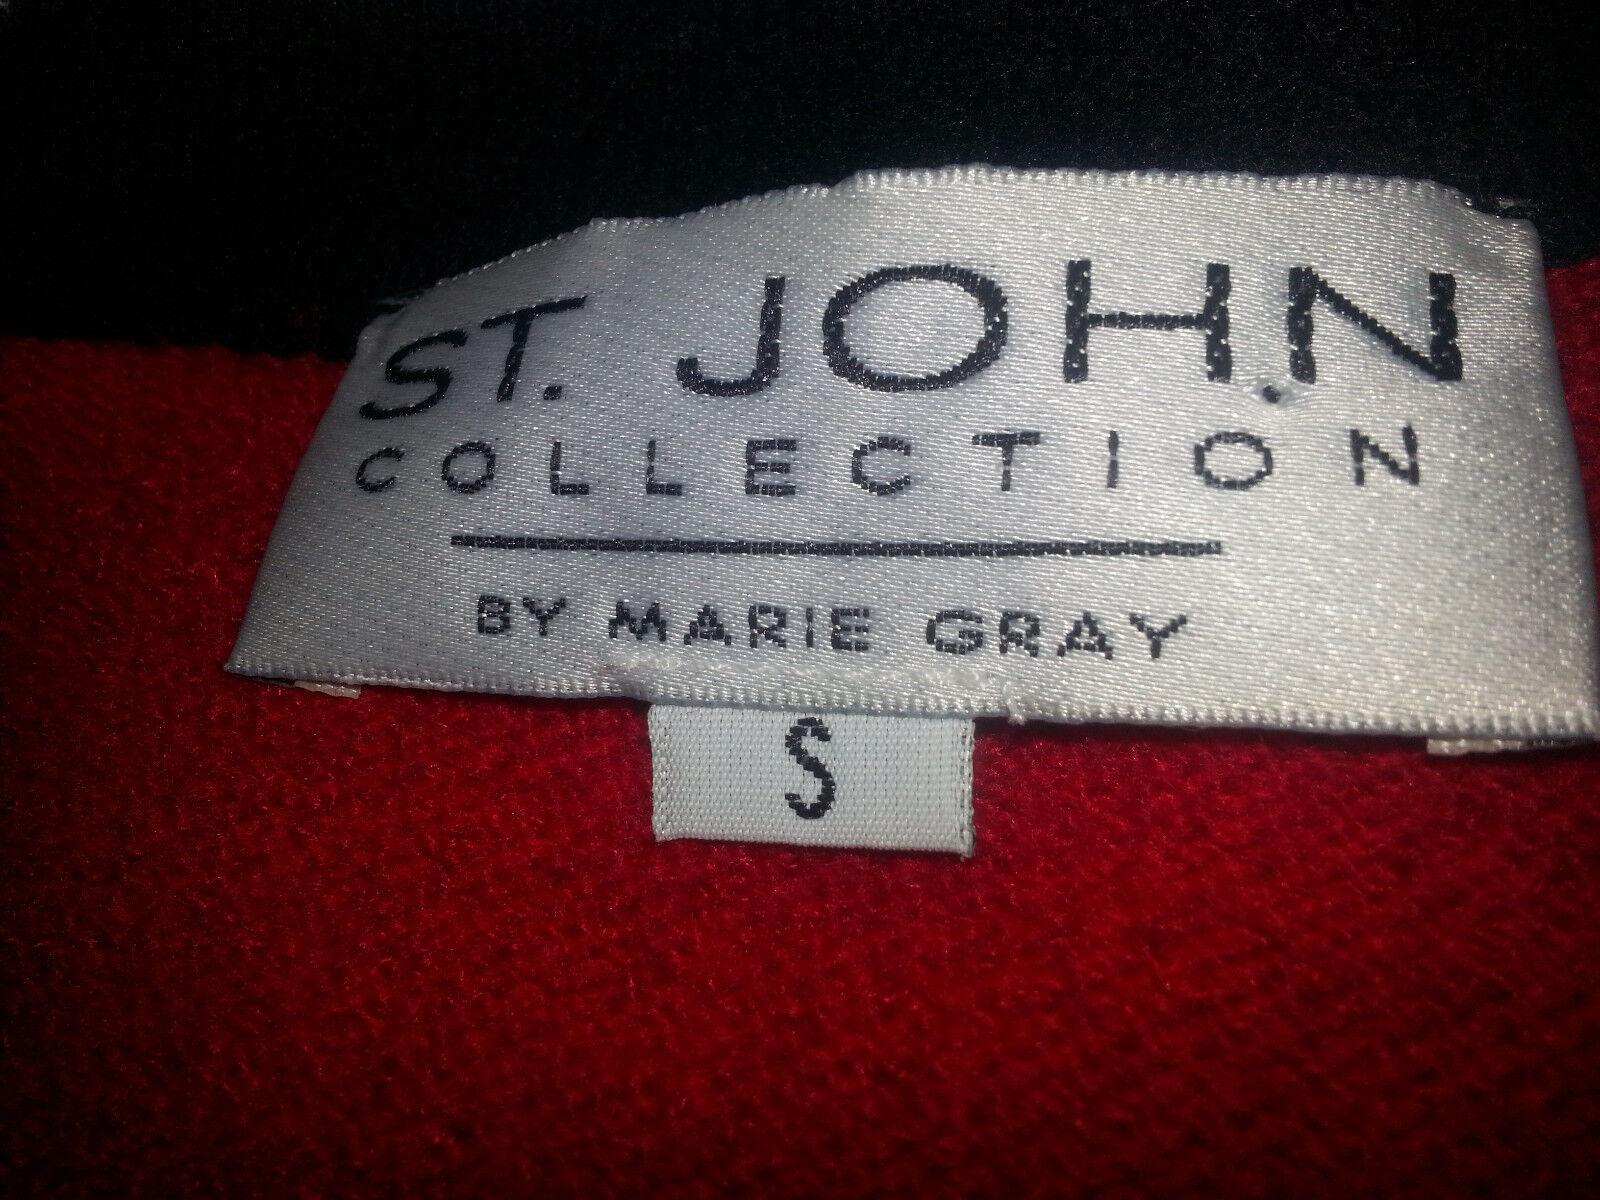 ST. ST. ST. JOHN Chaqueta Blazer para Mujer Frente Abierto Cárdigan Suéter Talla Pequeña Rojo f1e65f